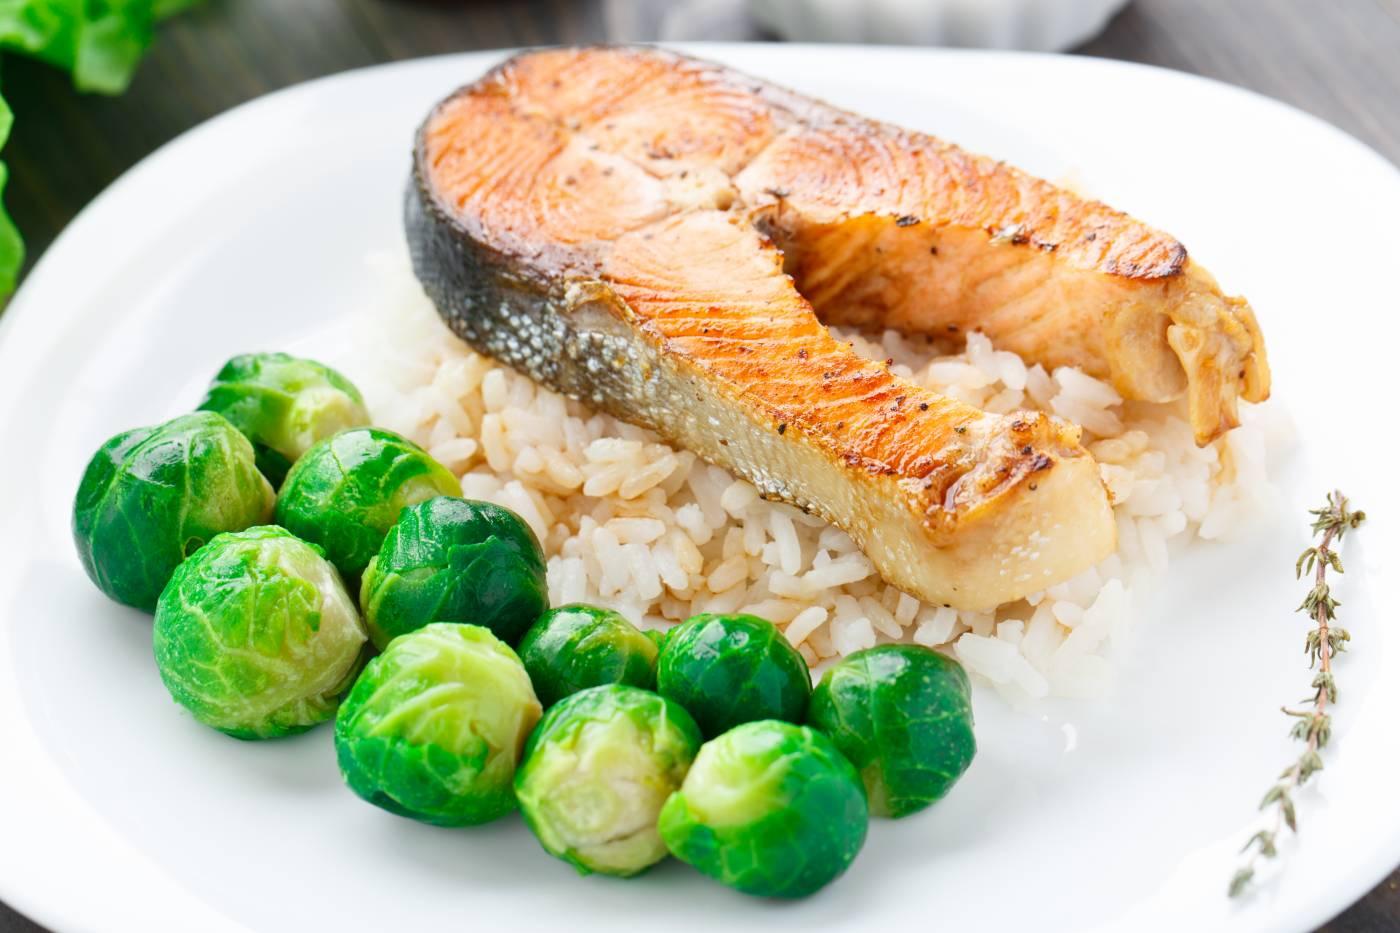 Divoký losos s rýží a kapustičkami